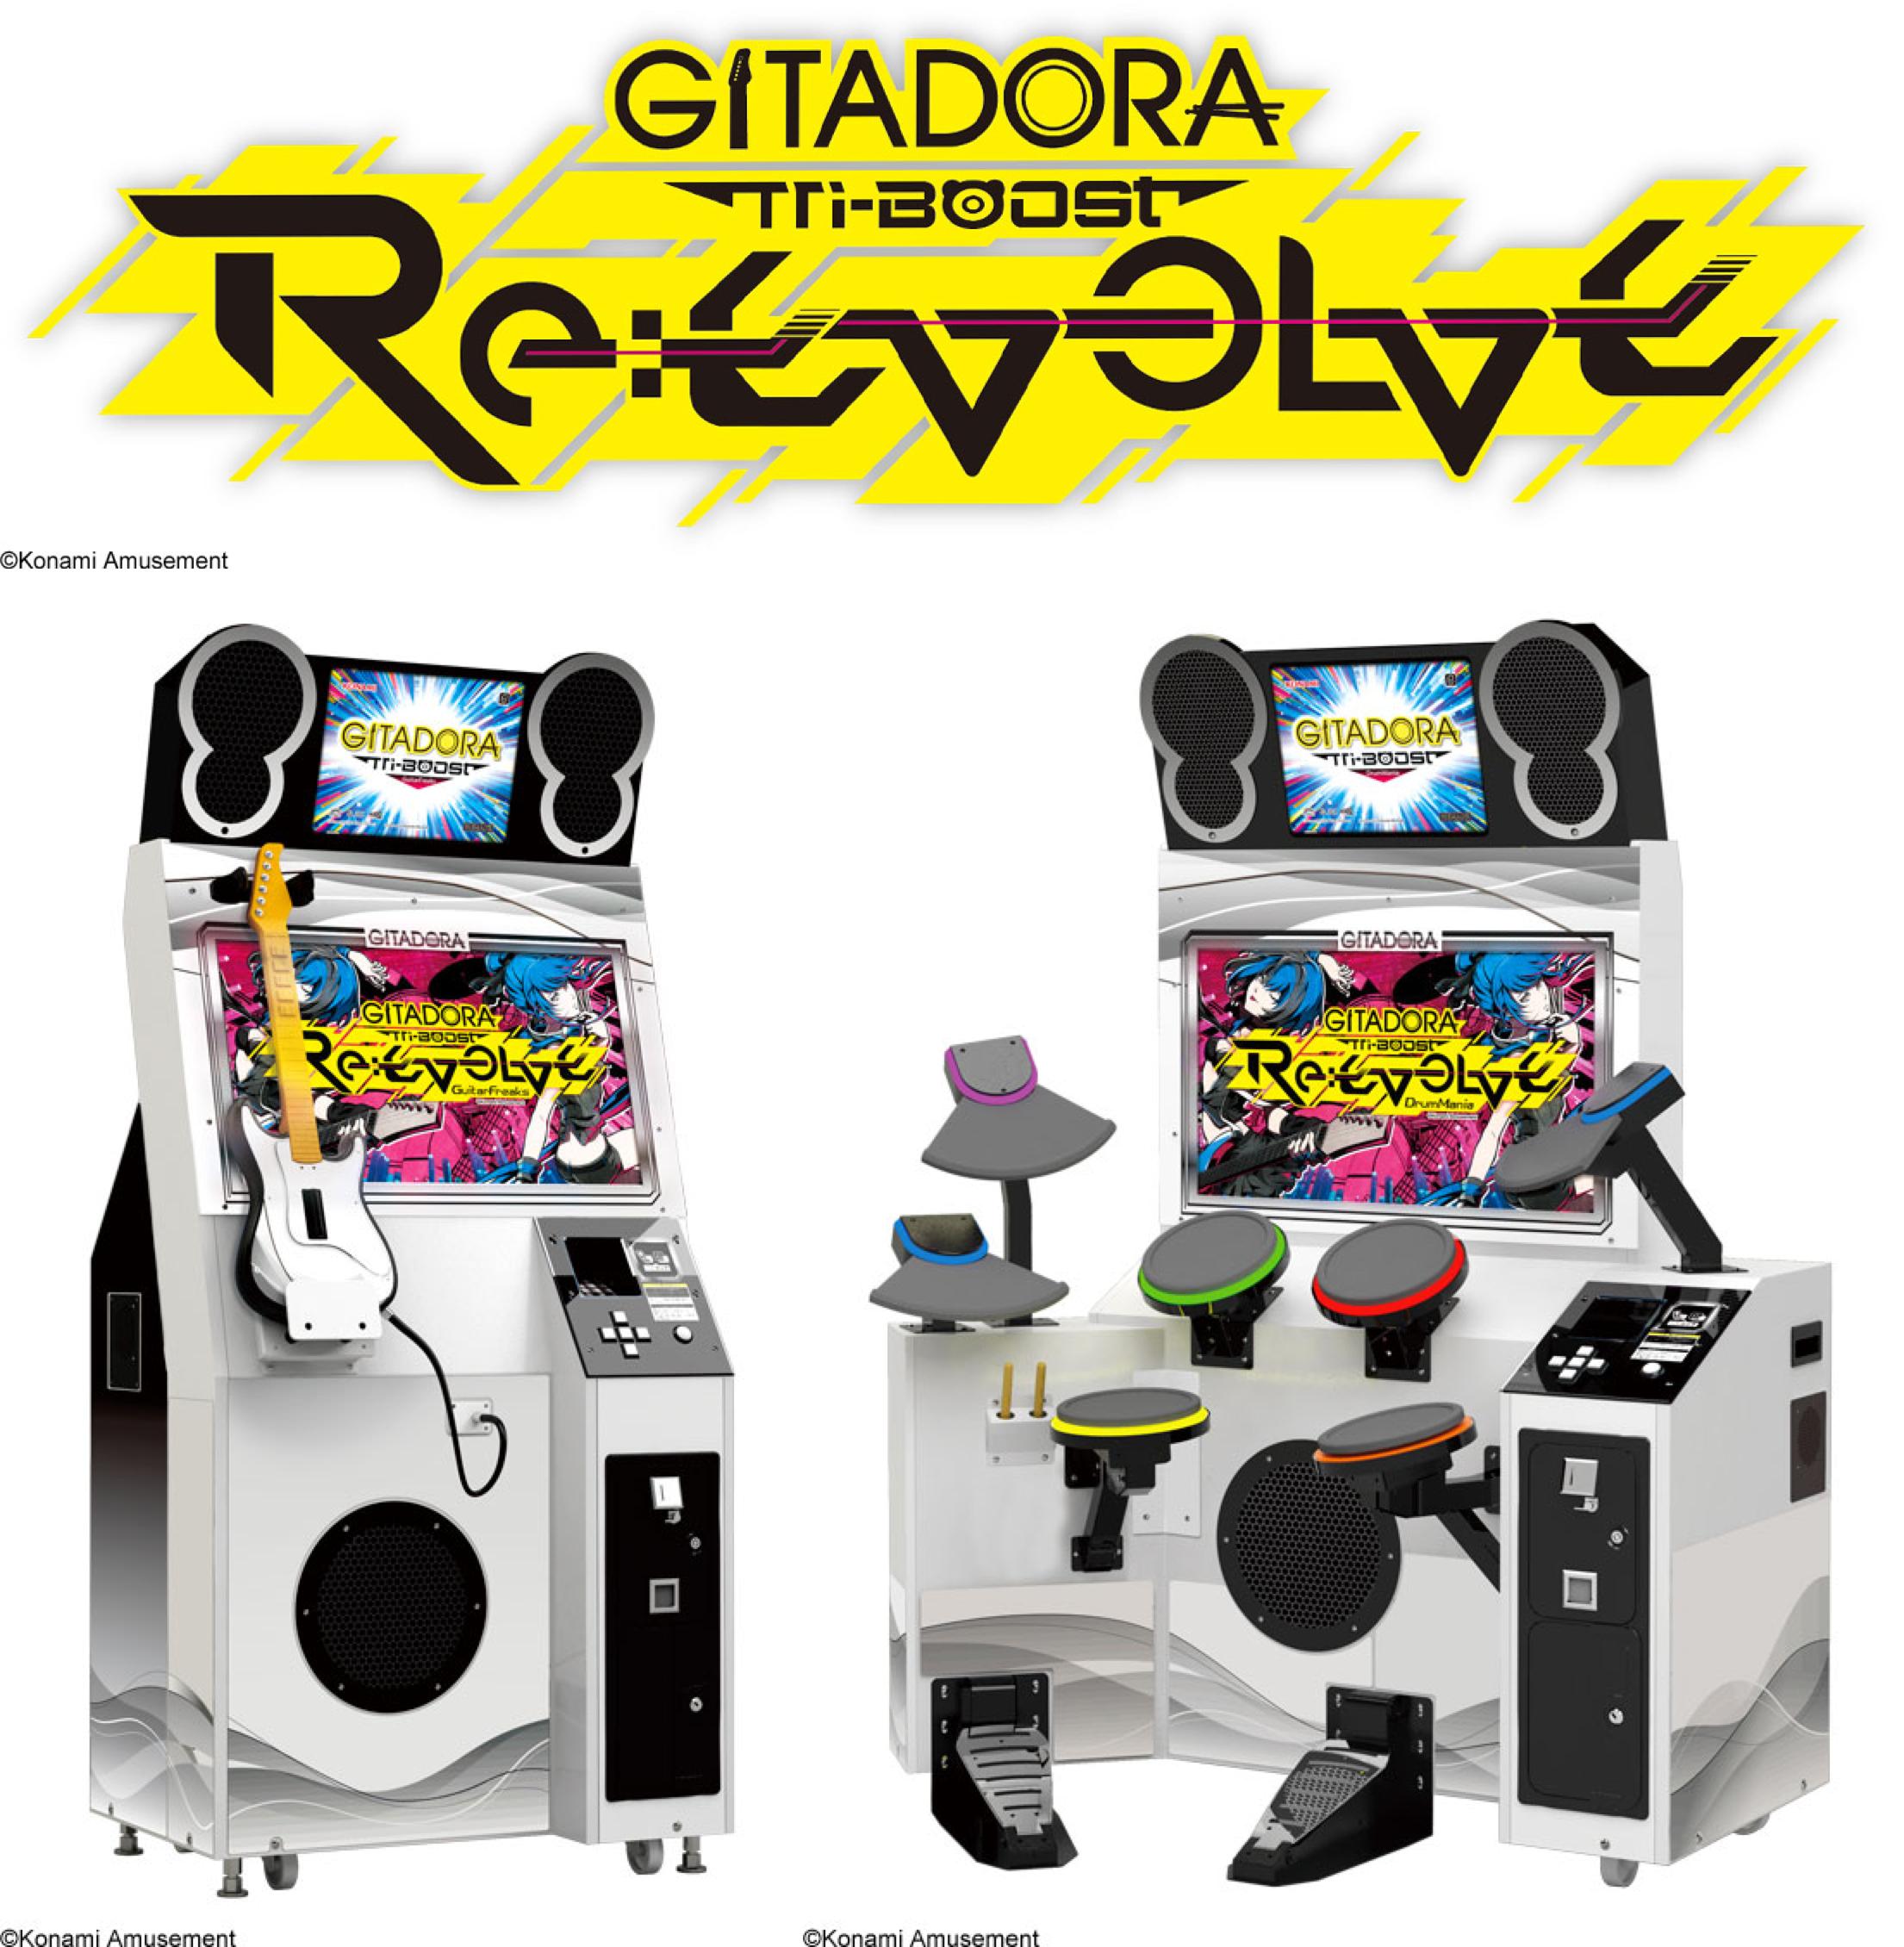 KONAMI(コナミアミューズメント)の音楽シュミレーションゲーム「ギタドラ(GITADORA Tri-Boost Re:EVOLVE)」